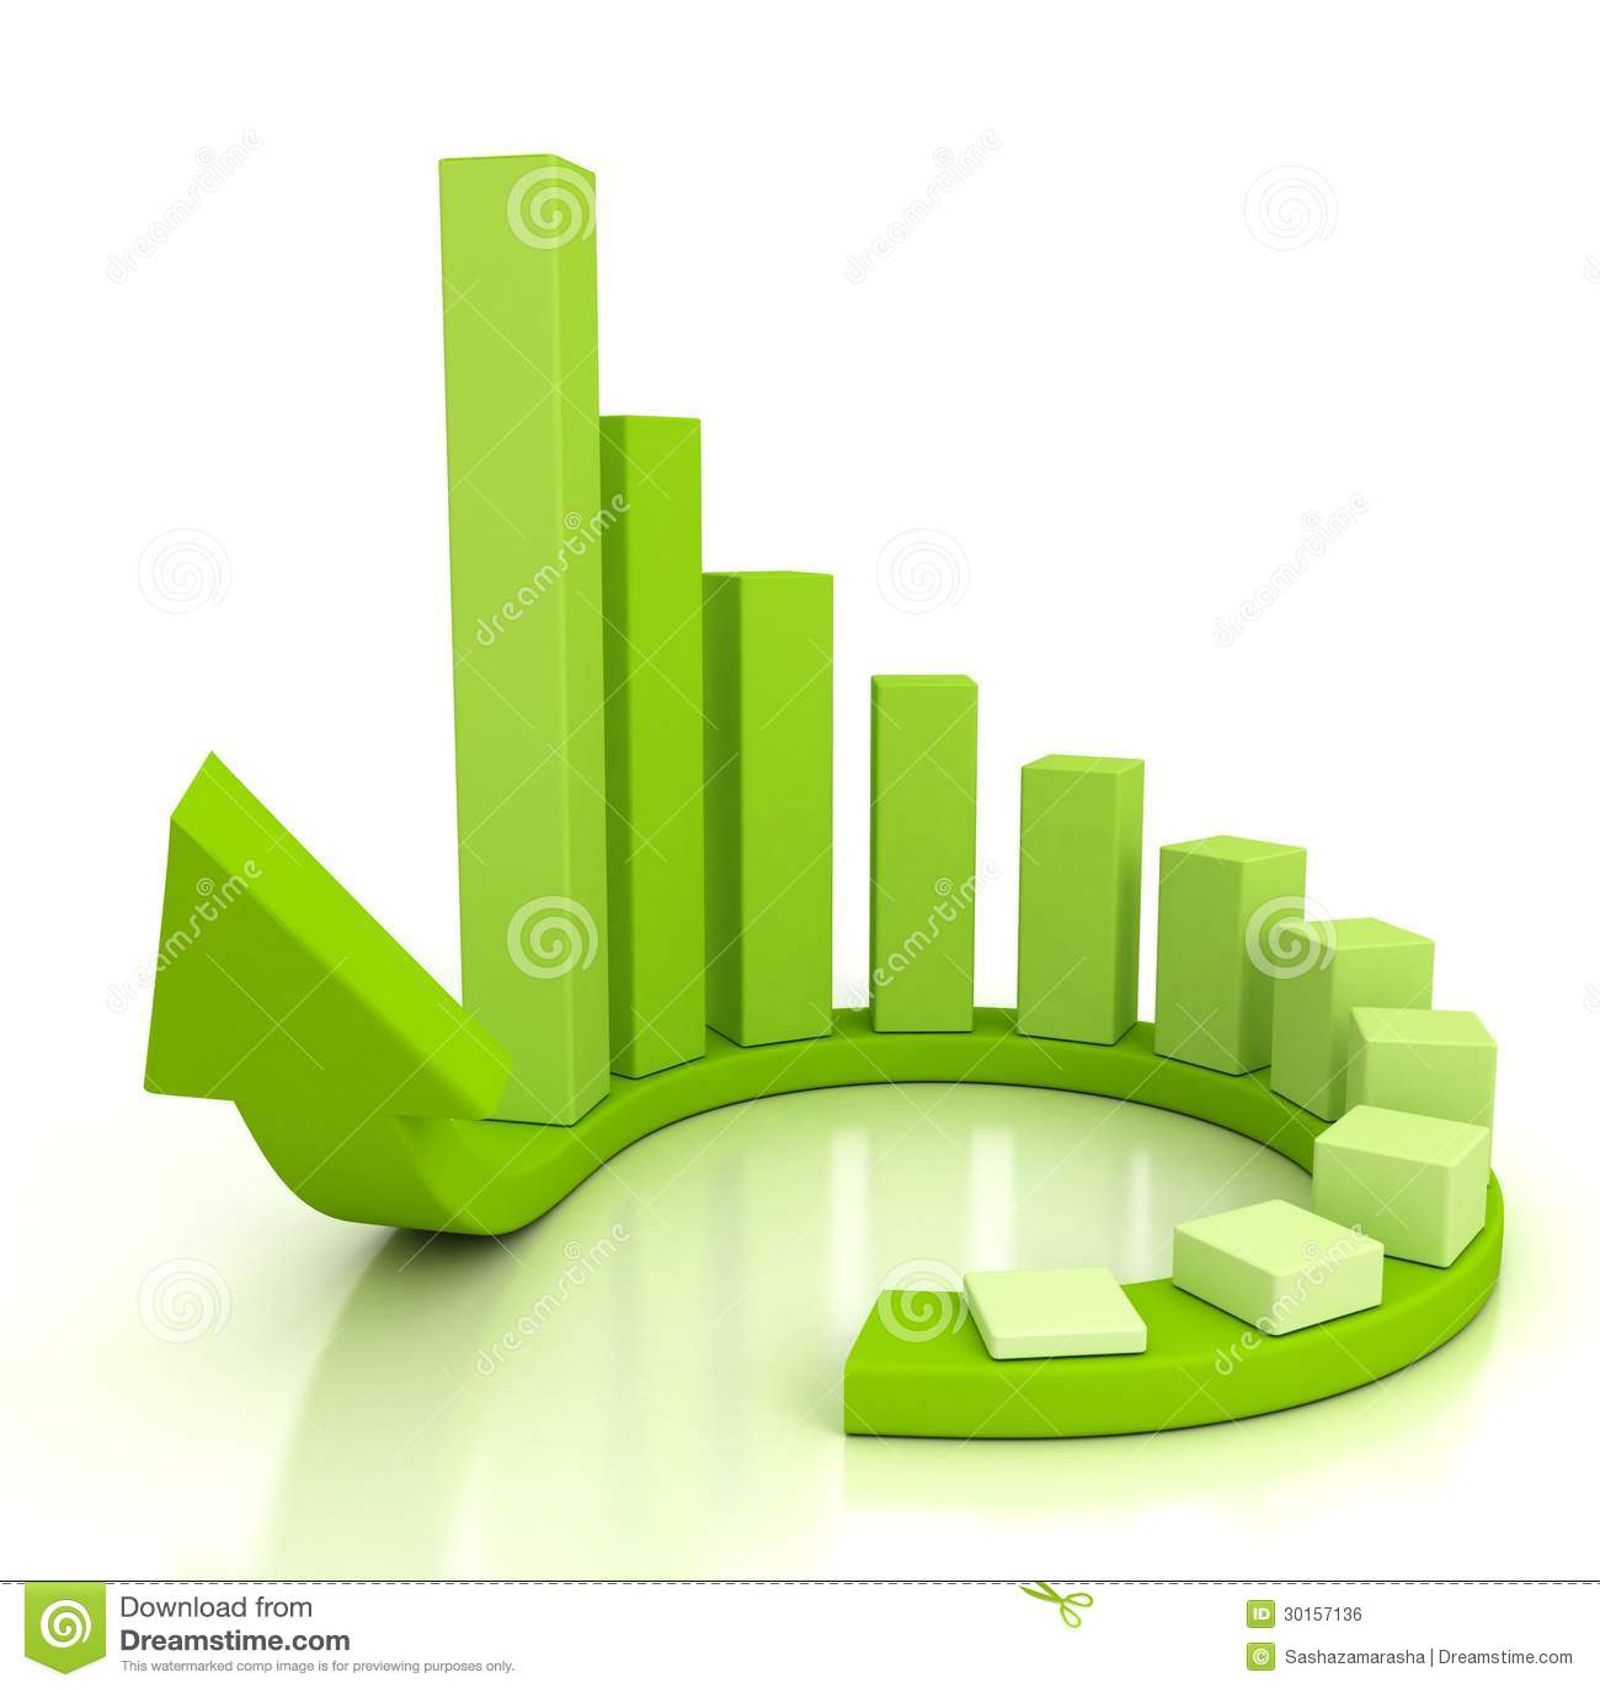 Green Success Business Bar Chart On Circle Growing Arrow Royalty Free Stock Image Image 30157136